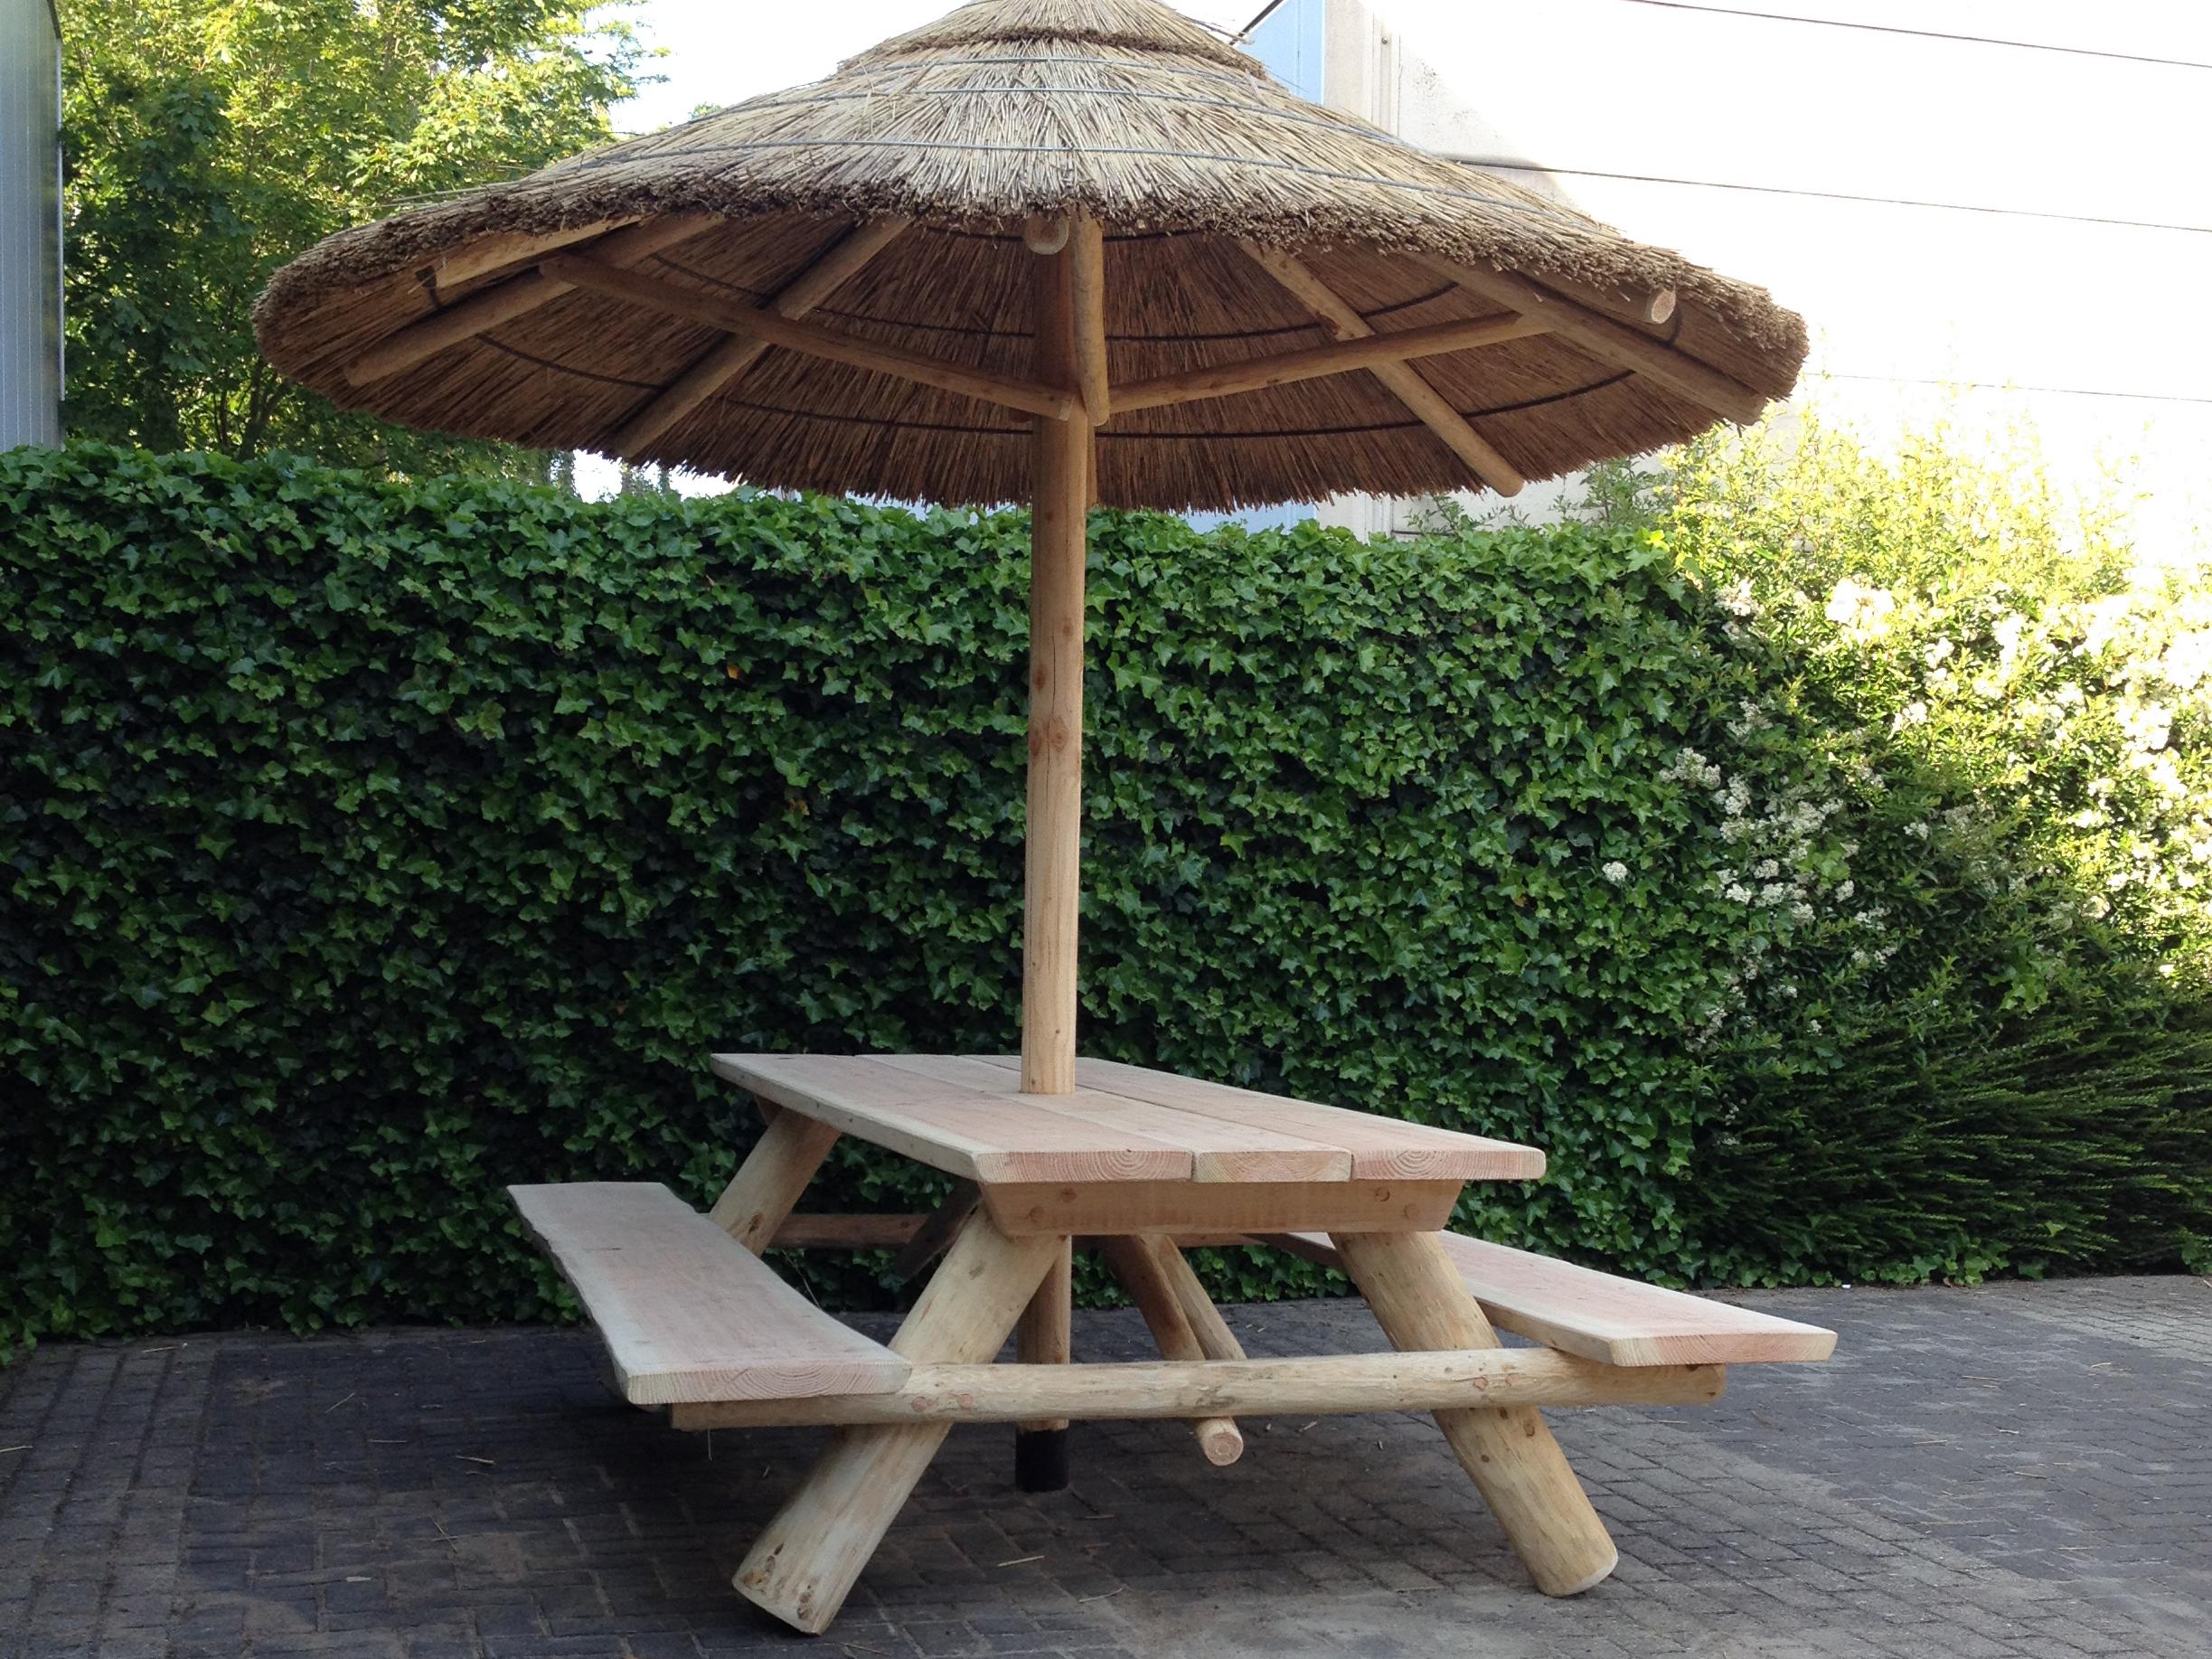 Picknick tafel met rieten parasol-liggend